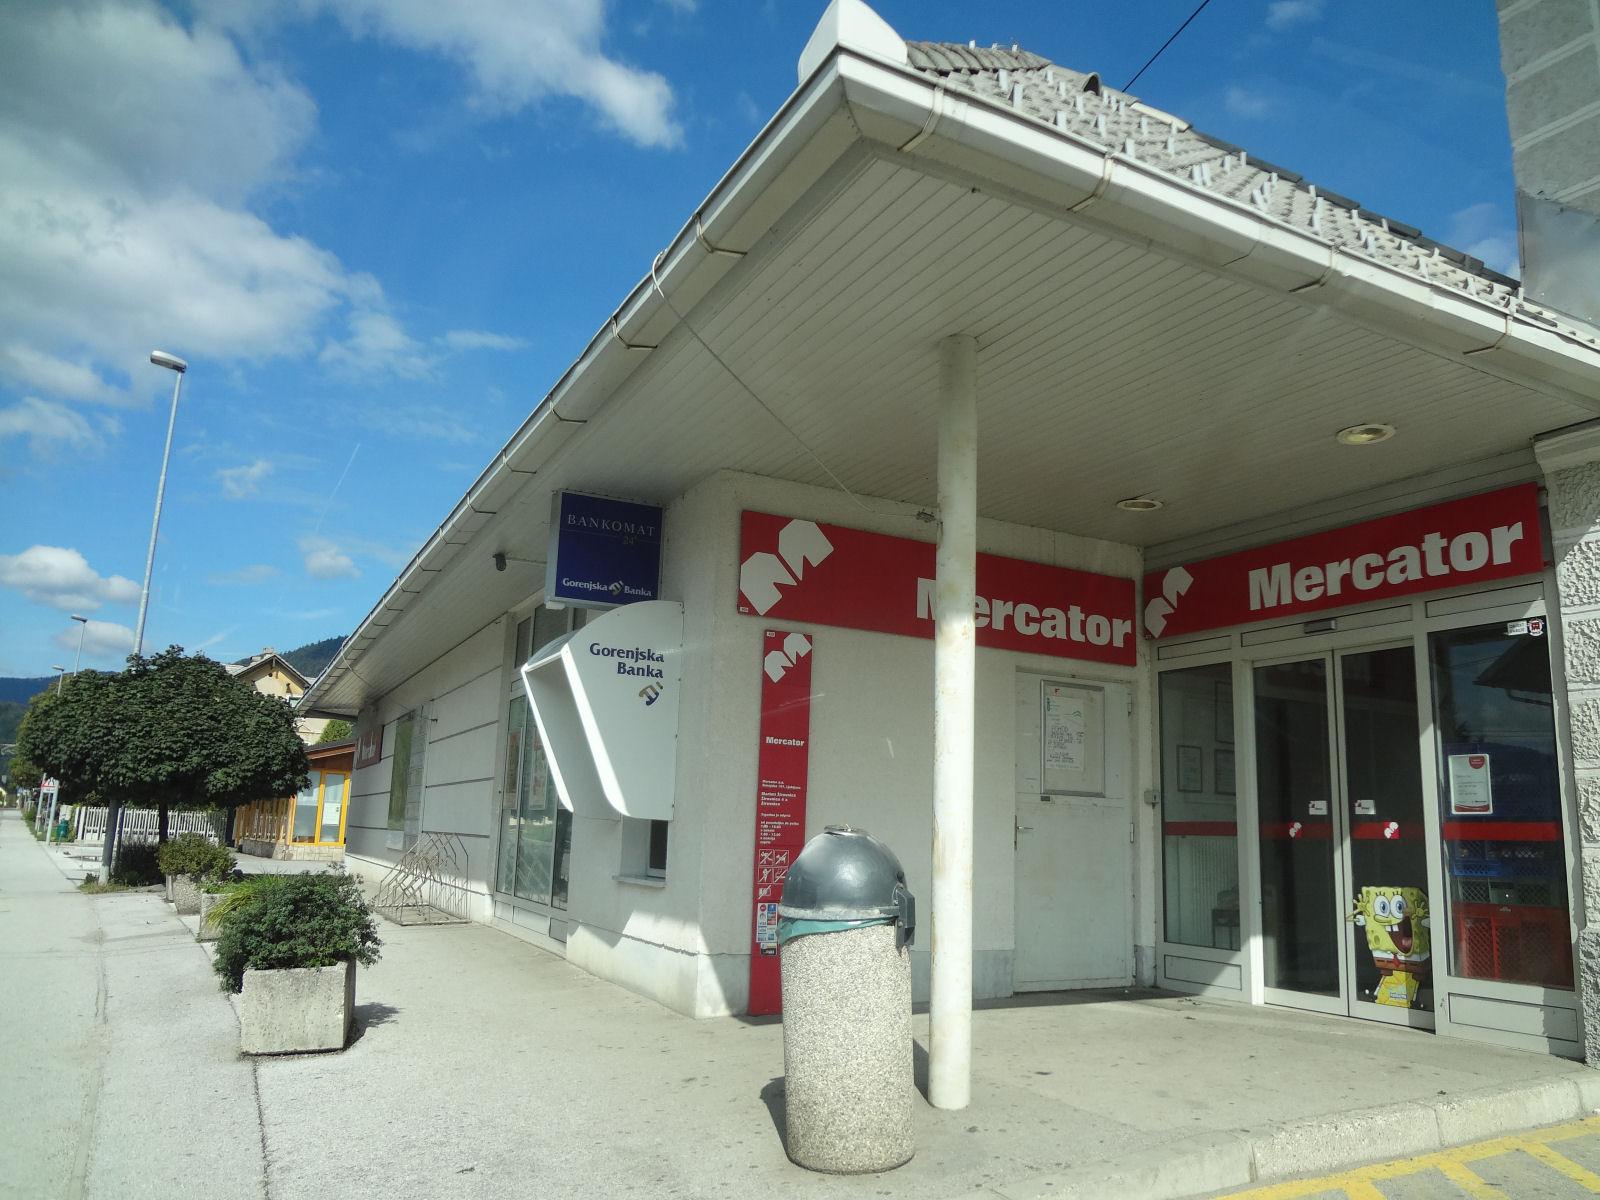 Mercator Market grocery store in Zirovnica, Slovenia